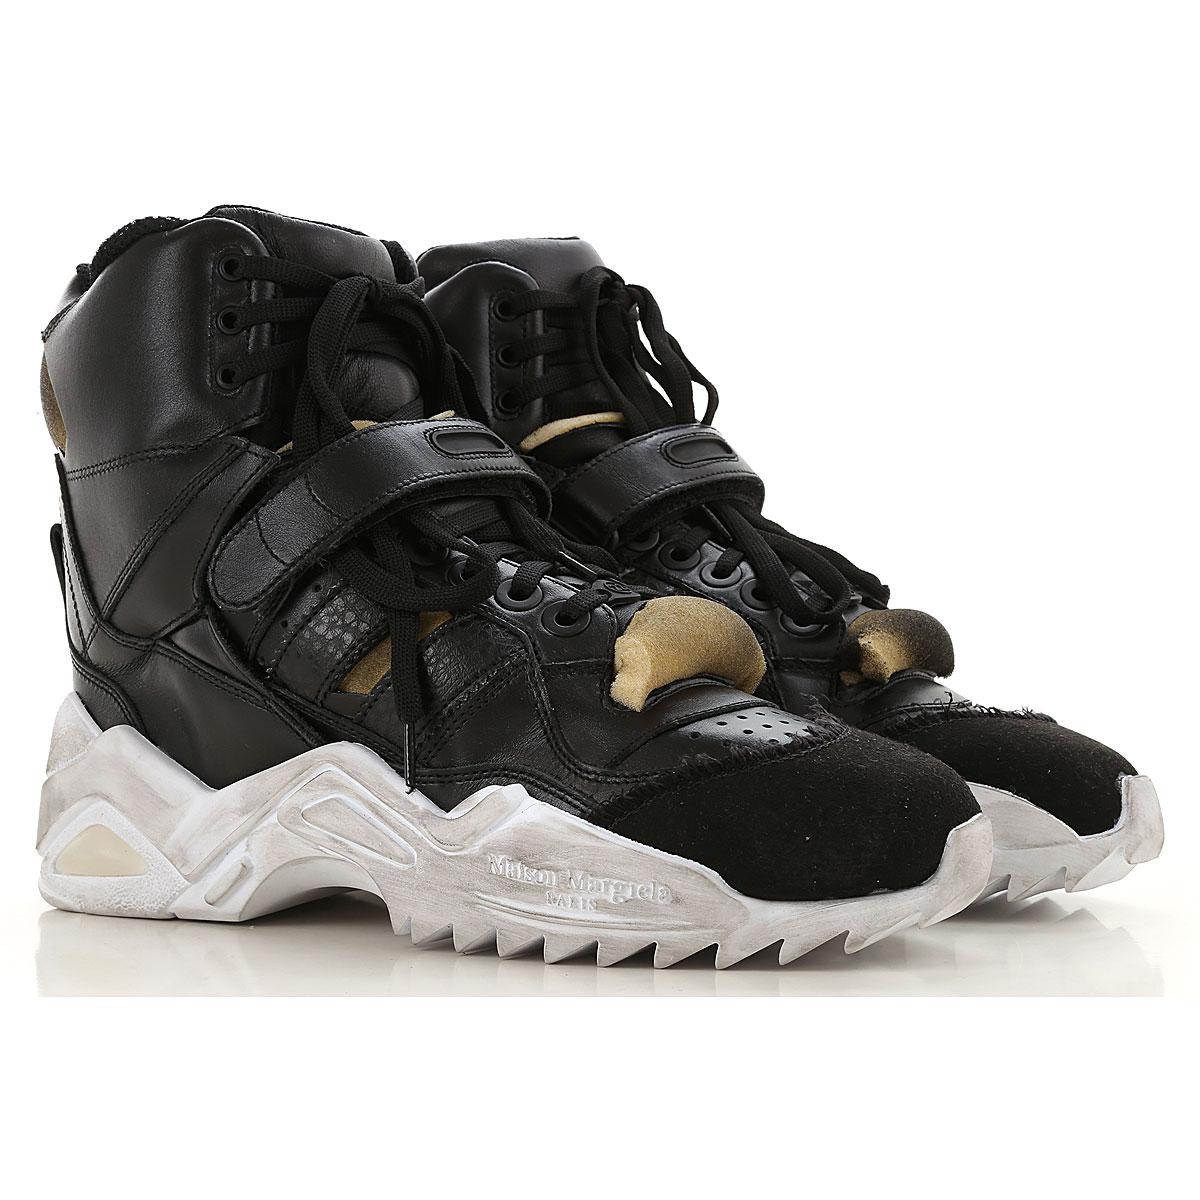 13de06447e5 Maison Martin Margiela Αθλητικά Παπούτσια για Γυναίκες Σε Έκπτωση ...